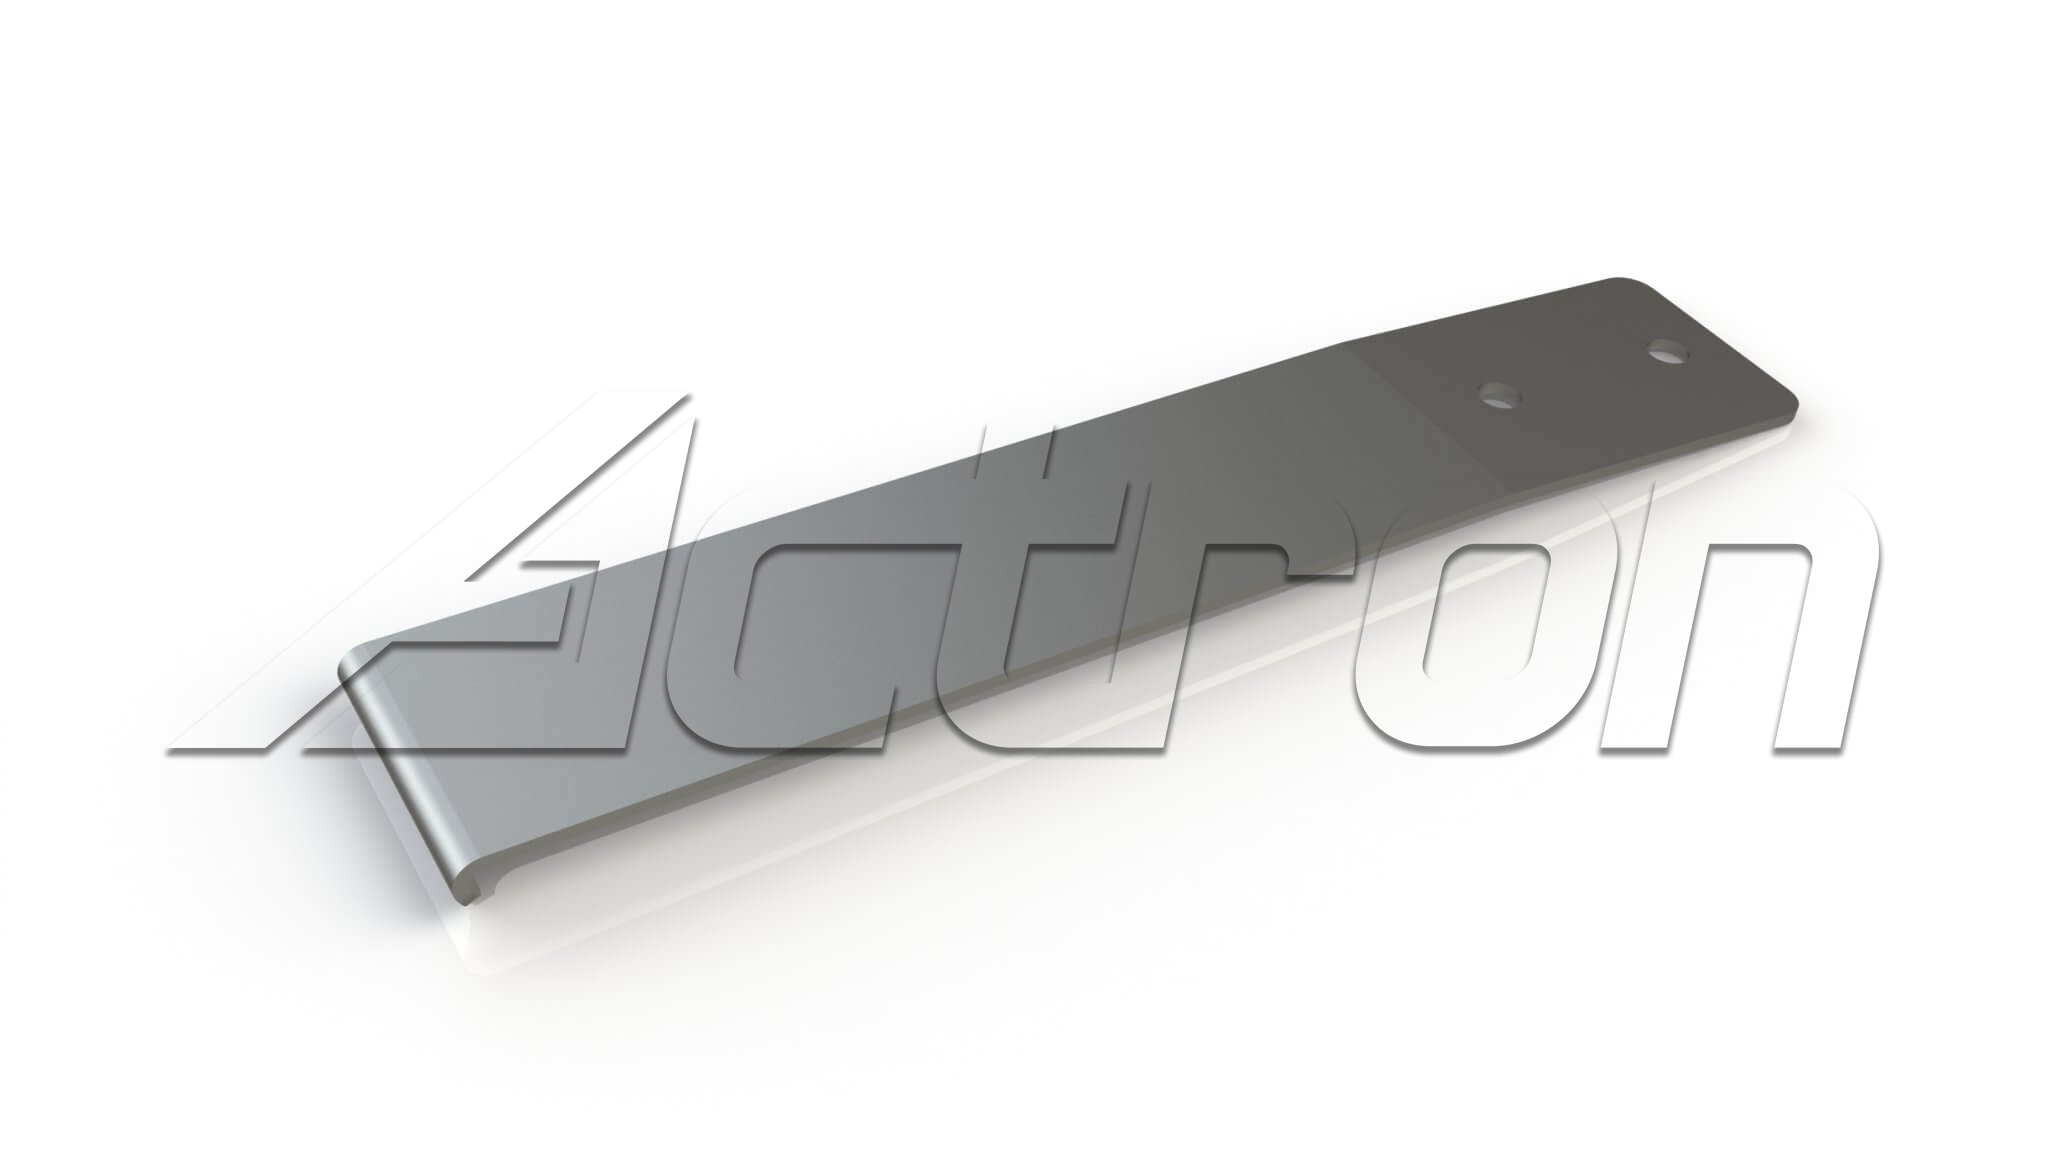 drawer-stop-5011-a32016.jpg